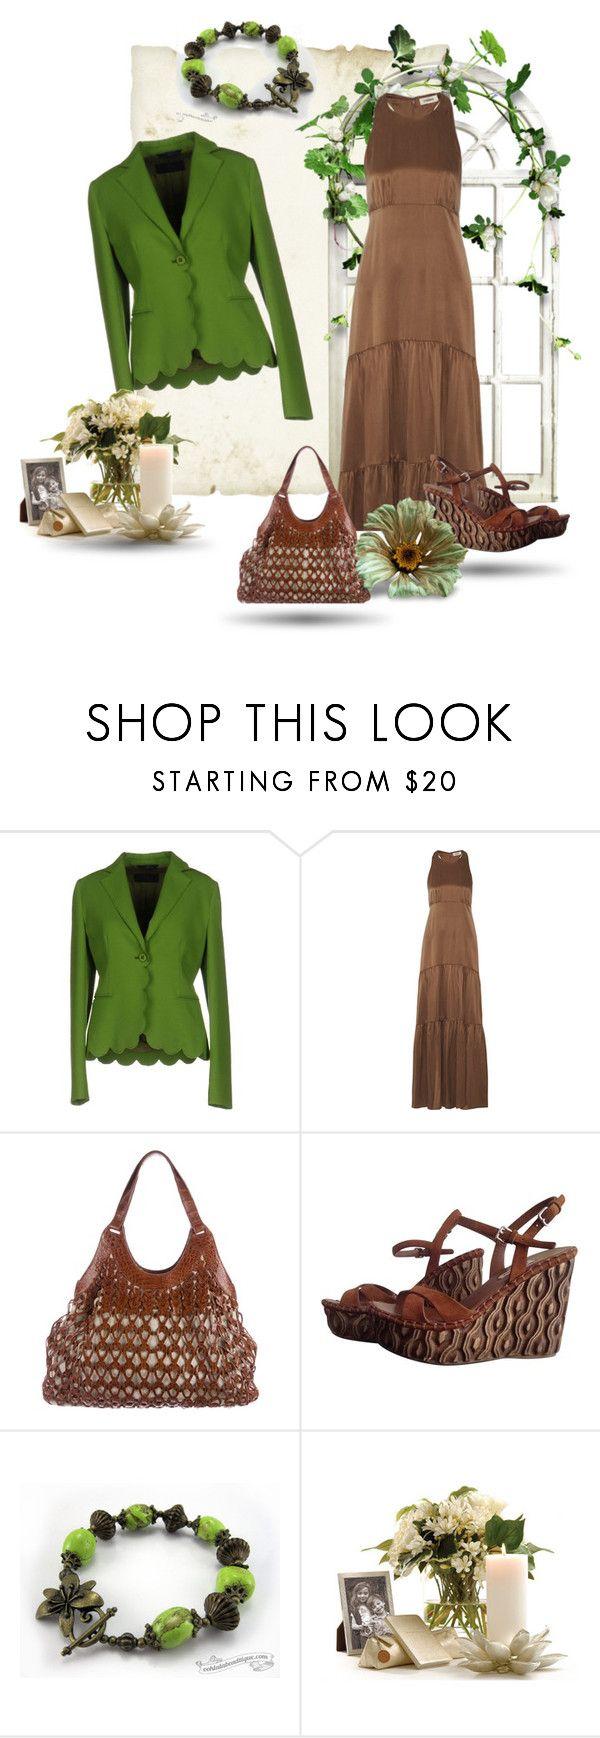 """Brown Maxi Dress Outfit - Jewelry by Ooh-la-la Beadtique"" by ooh-la-la-beadtique ❤ liked on Polyvore featuring Blue Les Copains, L'Agence, Nancy Gonzalez and Miu Miu"